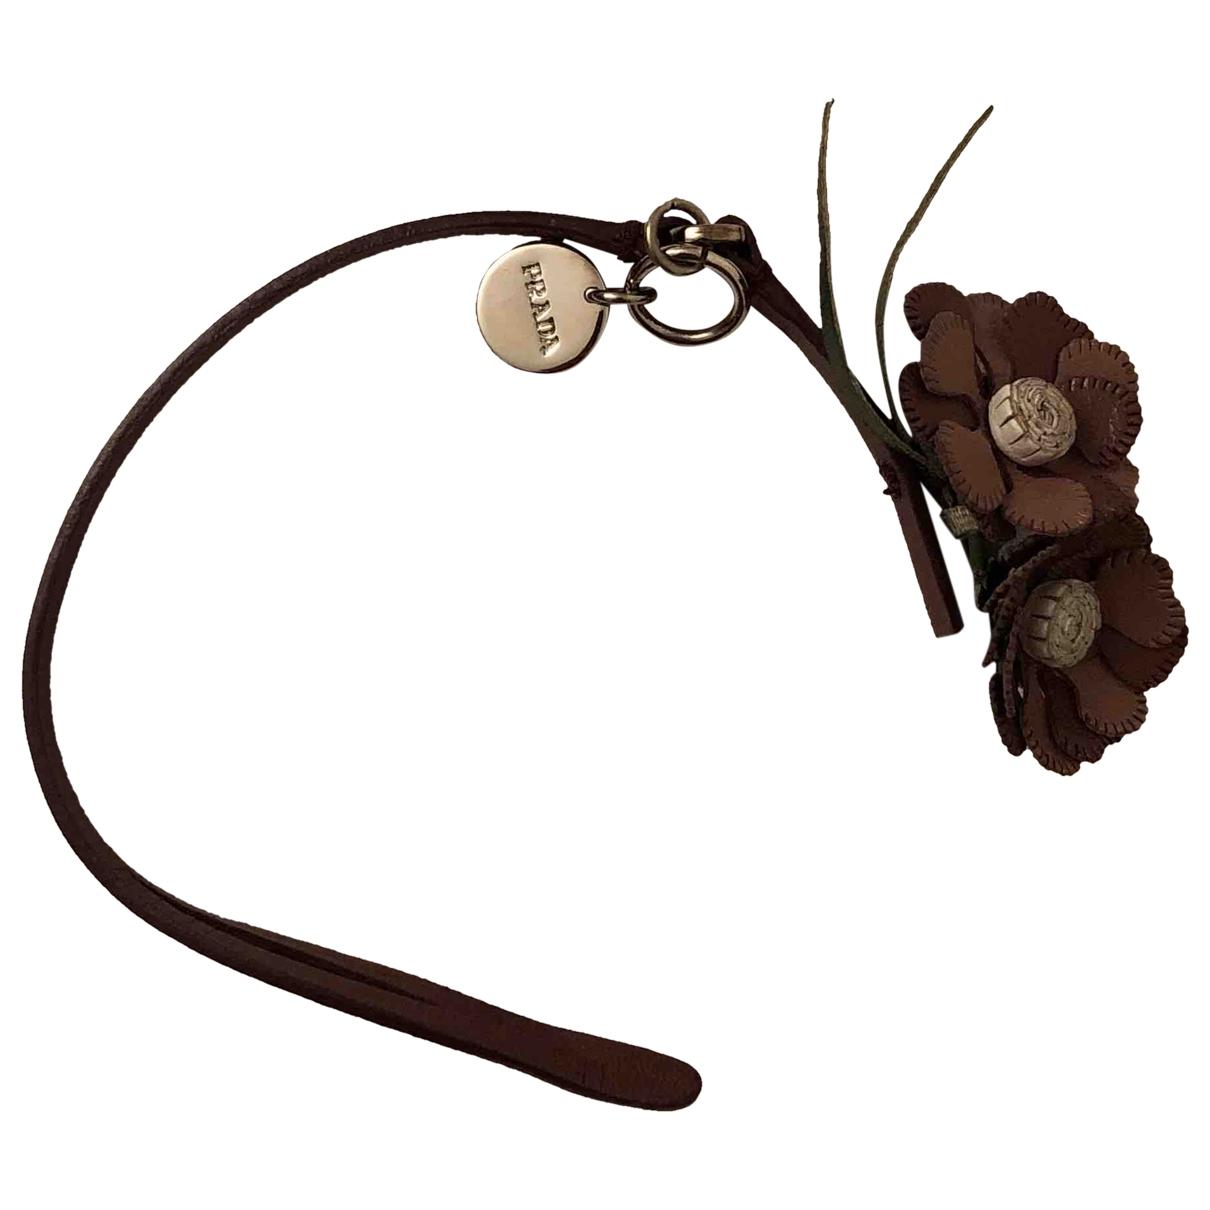 Prada - Bracelet   pour femme en cuir - rose